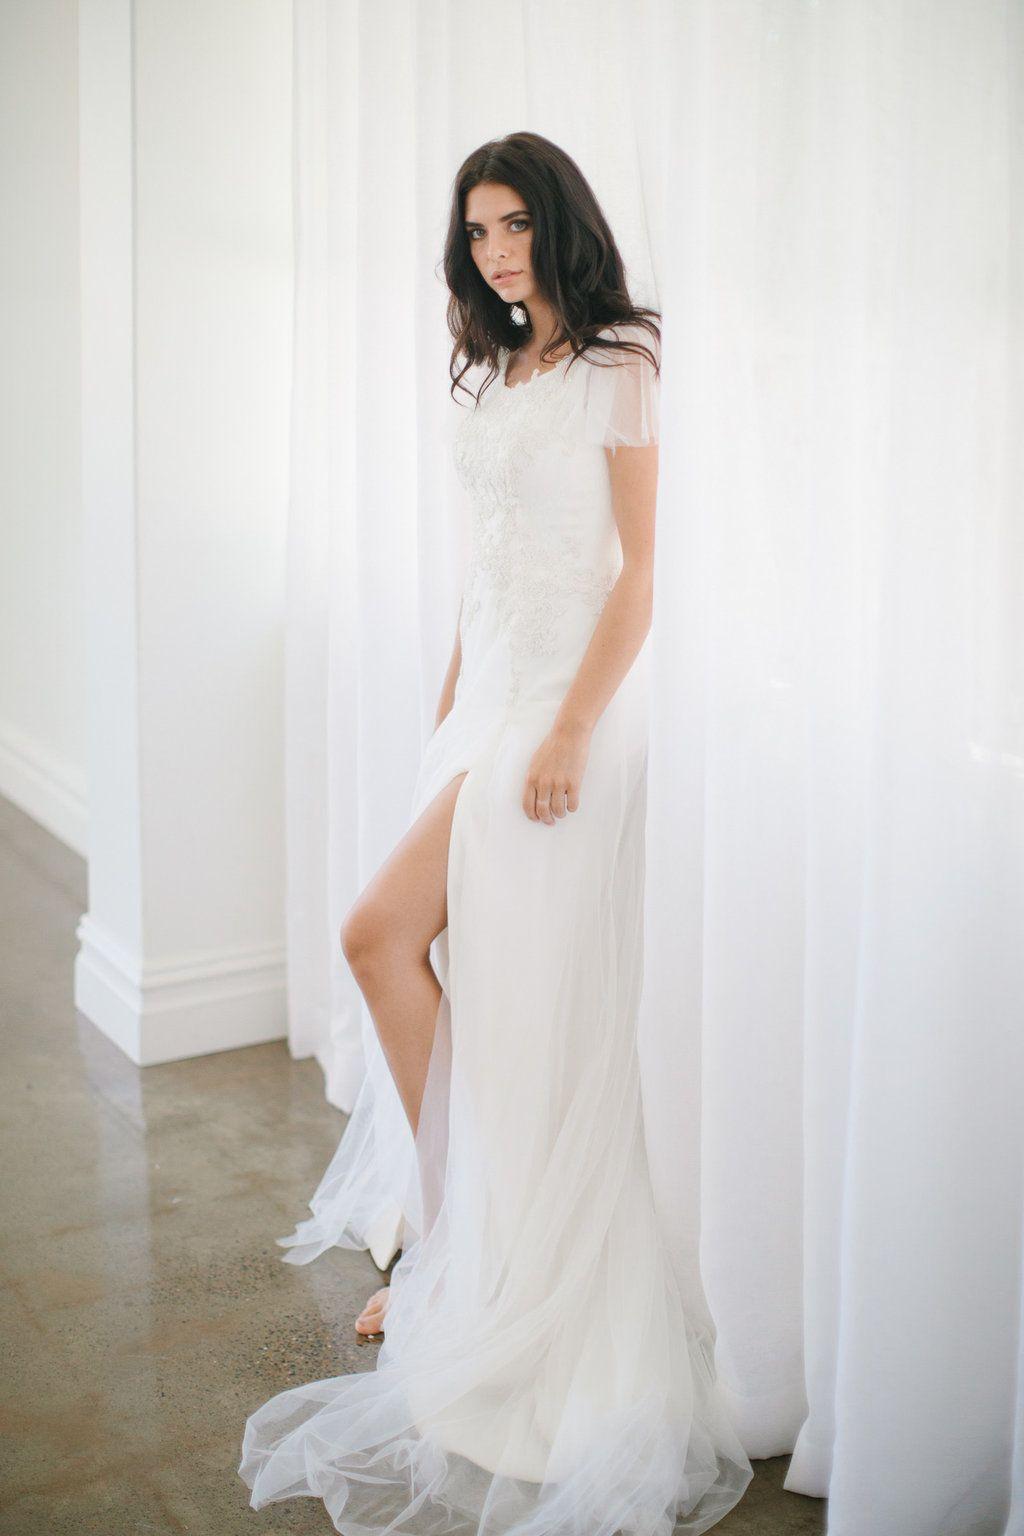 Wedding Dress By New Zealand Bridal Designer Hera Couture Couture Bridal Gowns Wedding Dresses Dresses